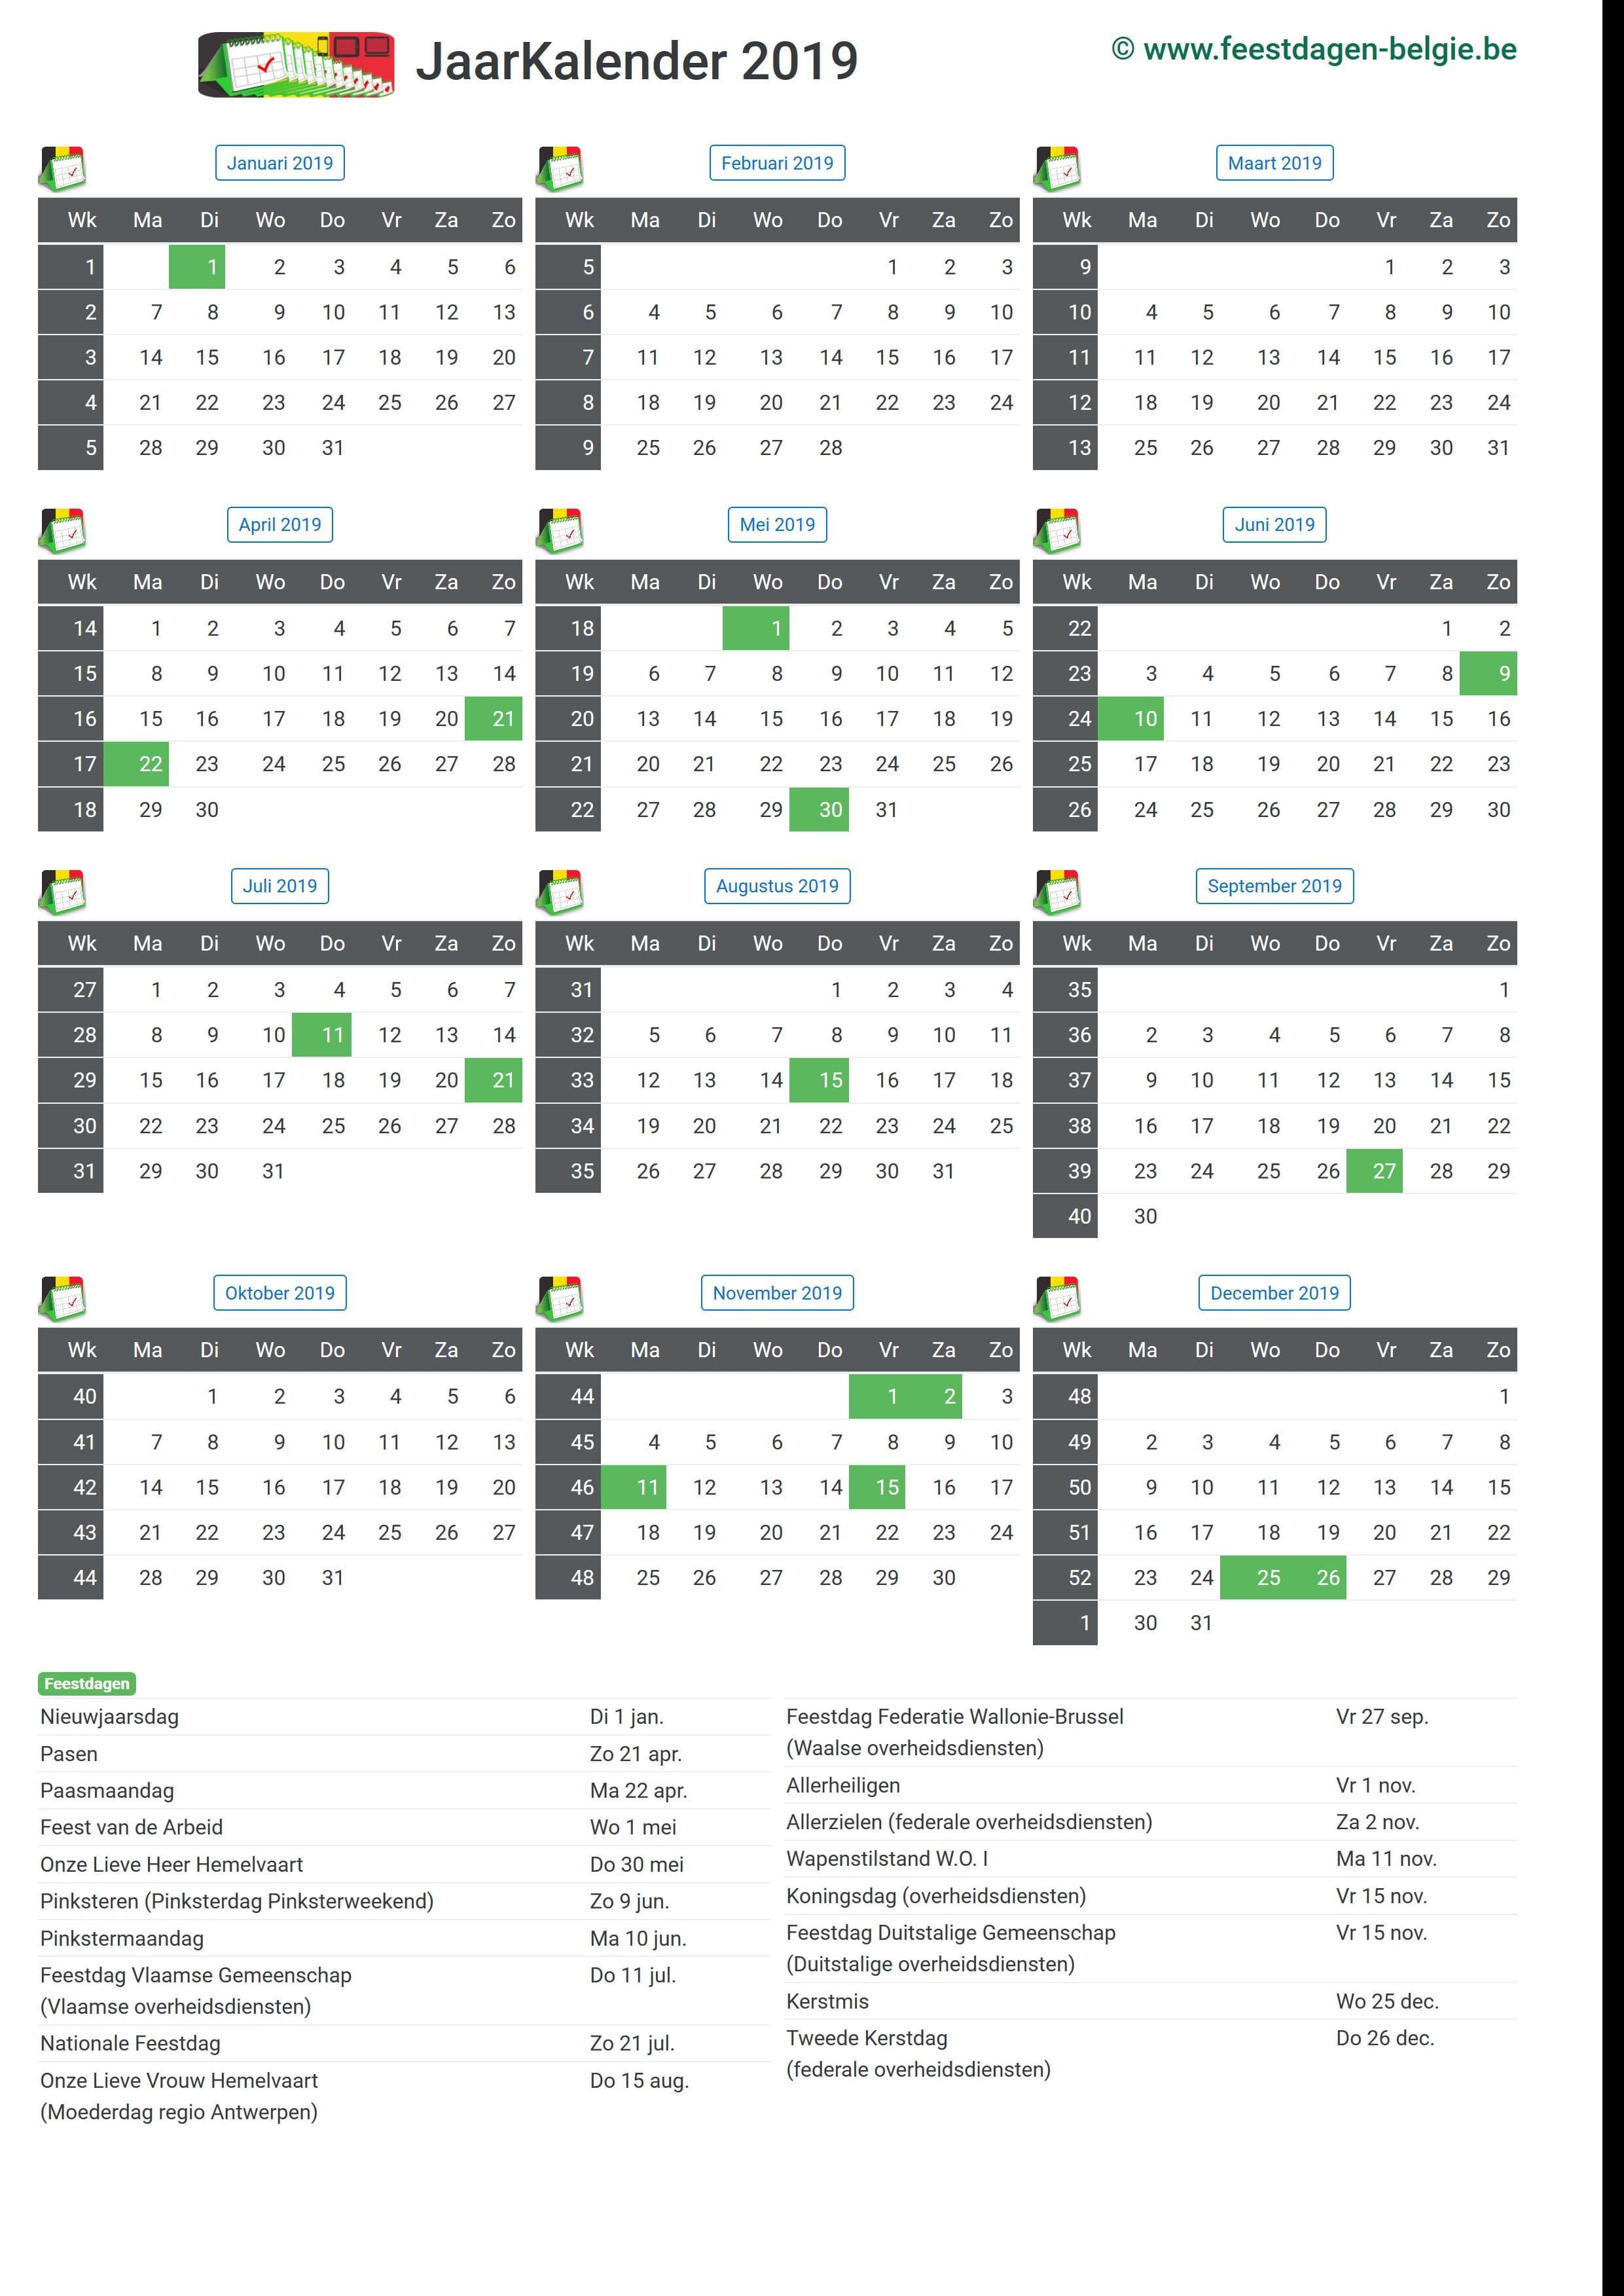 kalender 2019 jaarkalender belgie verlengde weekends. Black Bedroom Furniture Sets. Home Design Ideas